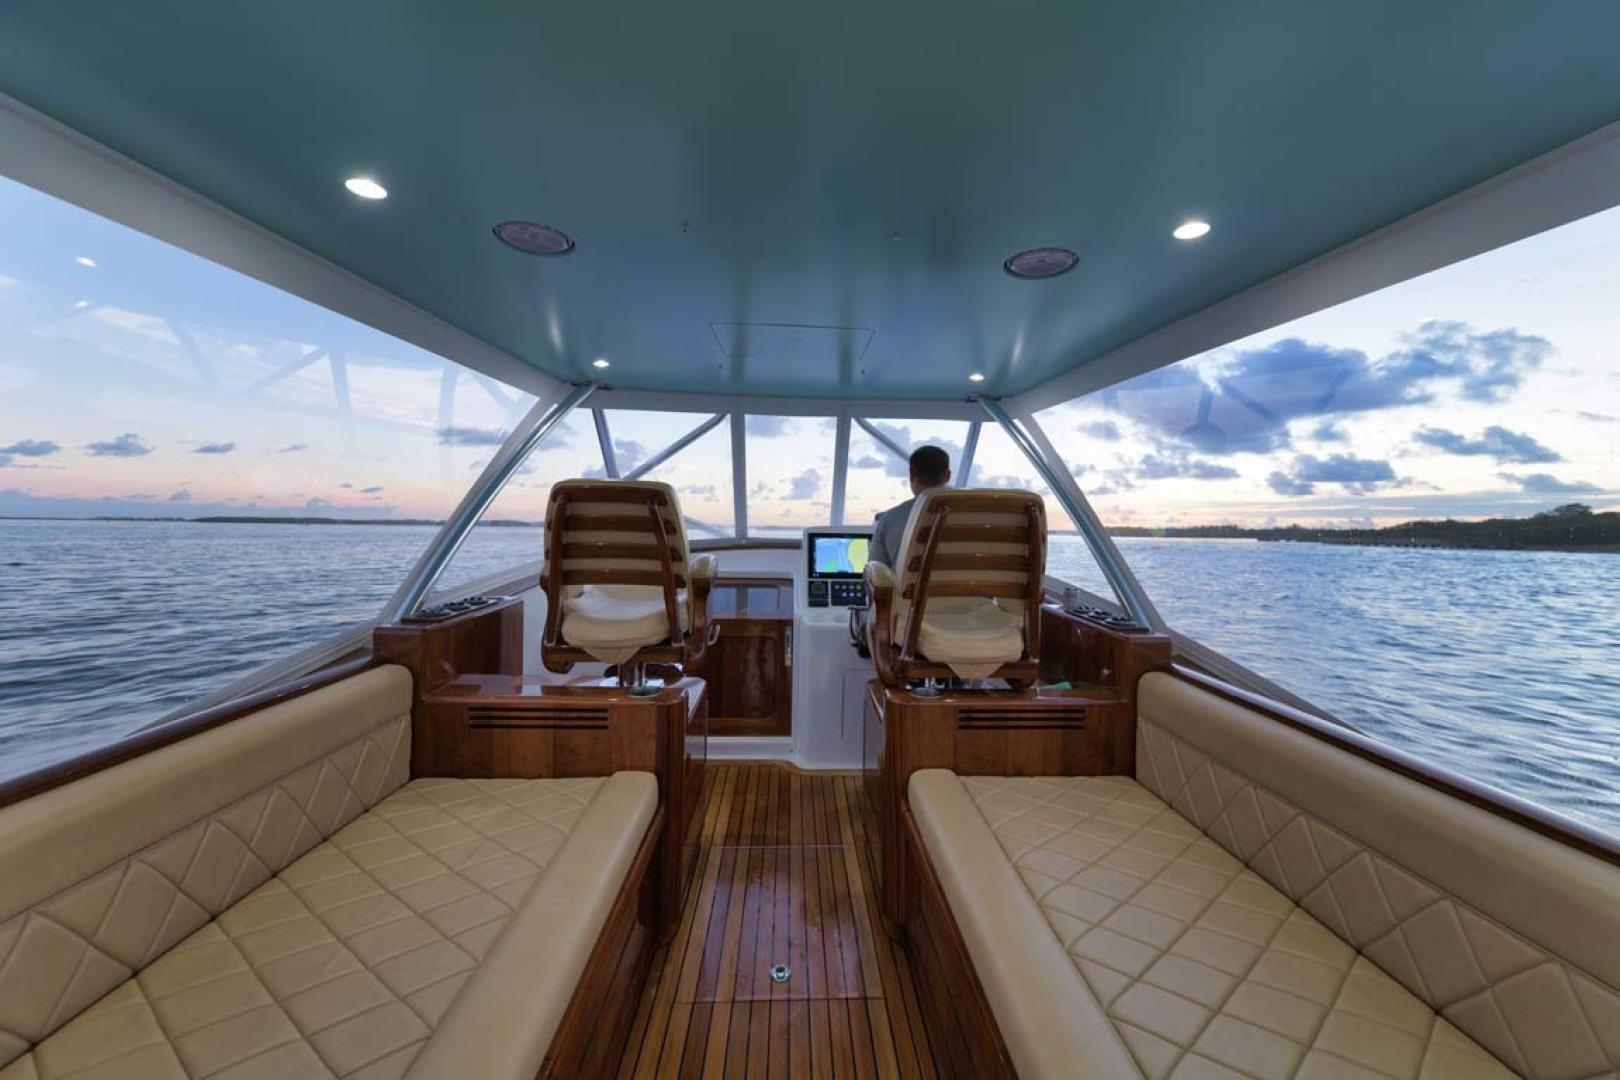 Winter Custom Yachts-46 Walkaround 2019-Family Circus Stuart-Florida-United States-Teak Mezzanine Seating with Diamond Stitched Ultra-Leather Upholstery and Storage Below-1563757 | Thumbnail